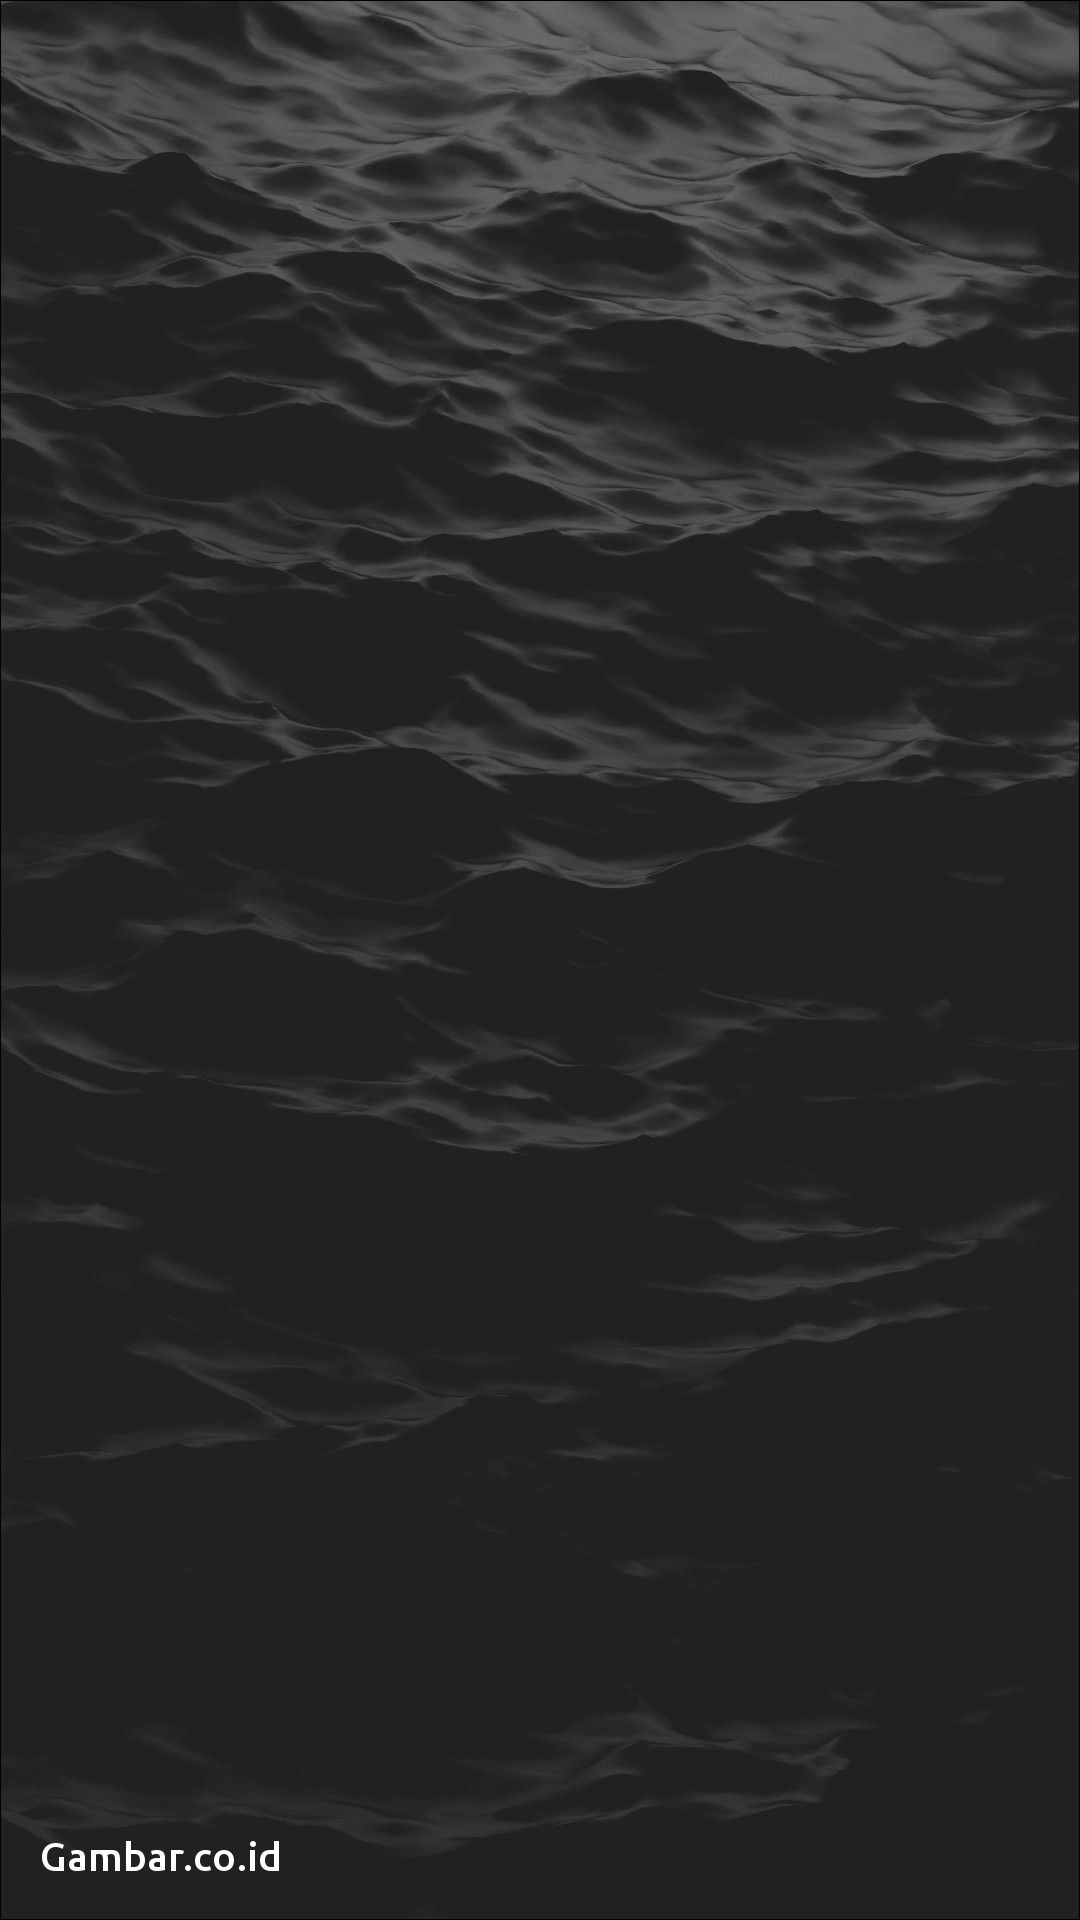 Wallpaper Iphone Hight Quality 113 Dark Wallpaper Iphone Black Wallpaper Iphone Jet Black Iphone